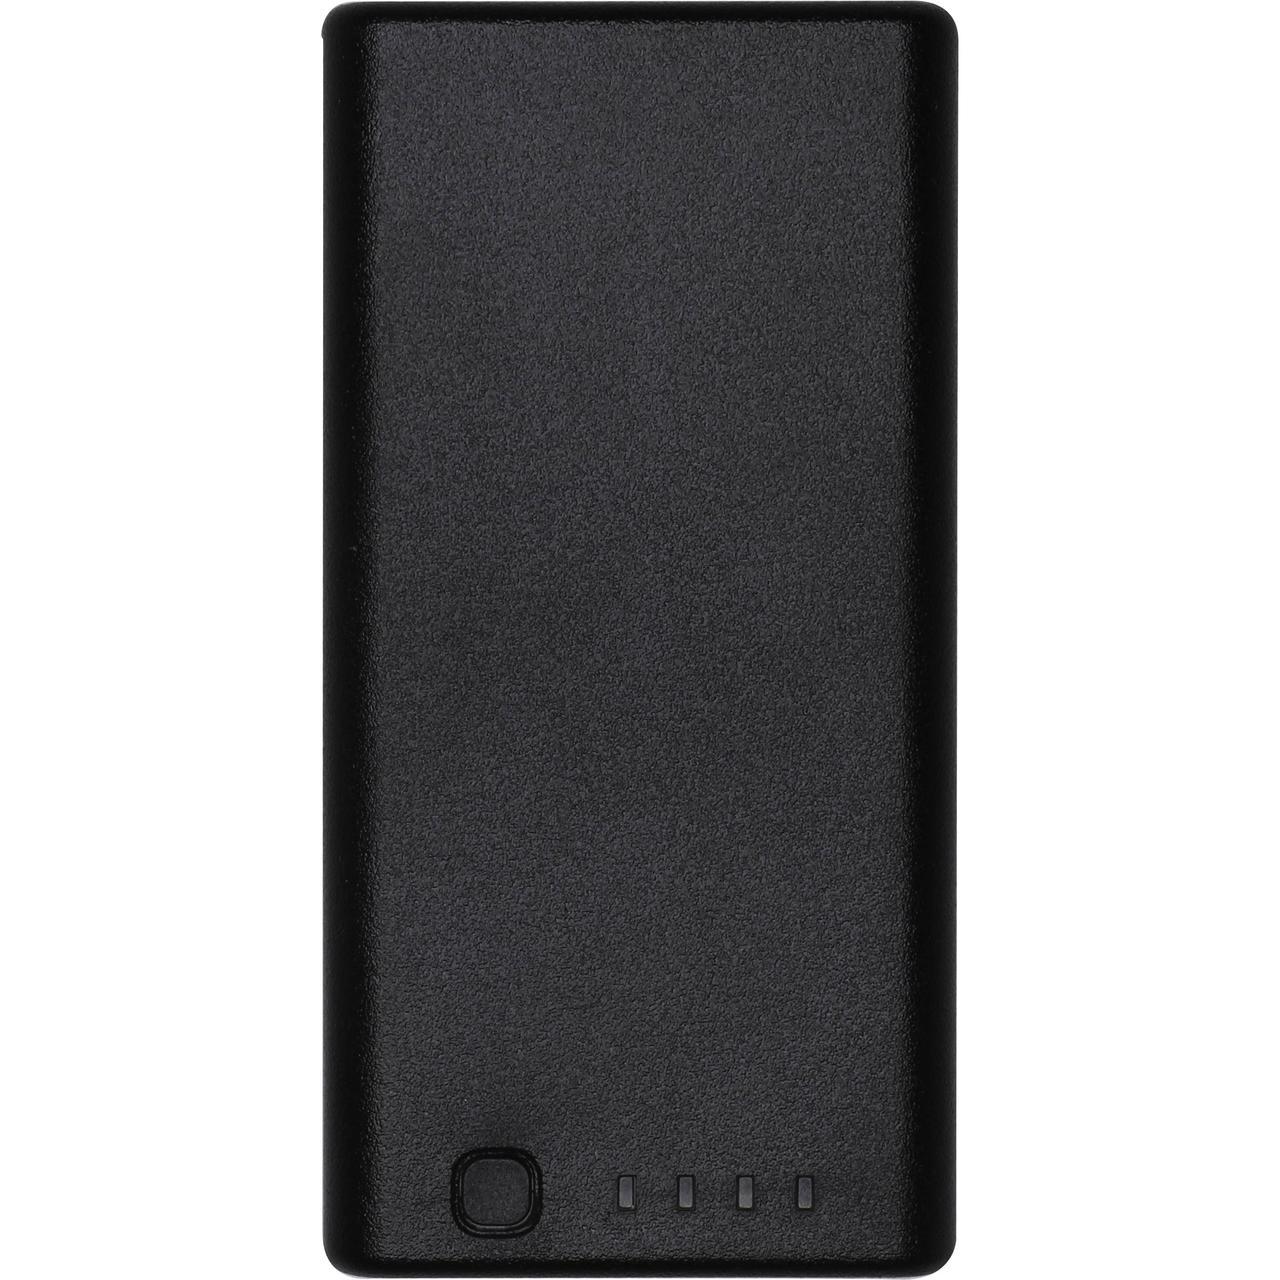 Батарея WB37 для Cendence/CrystalSky Intelligent Battery